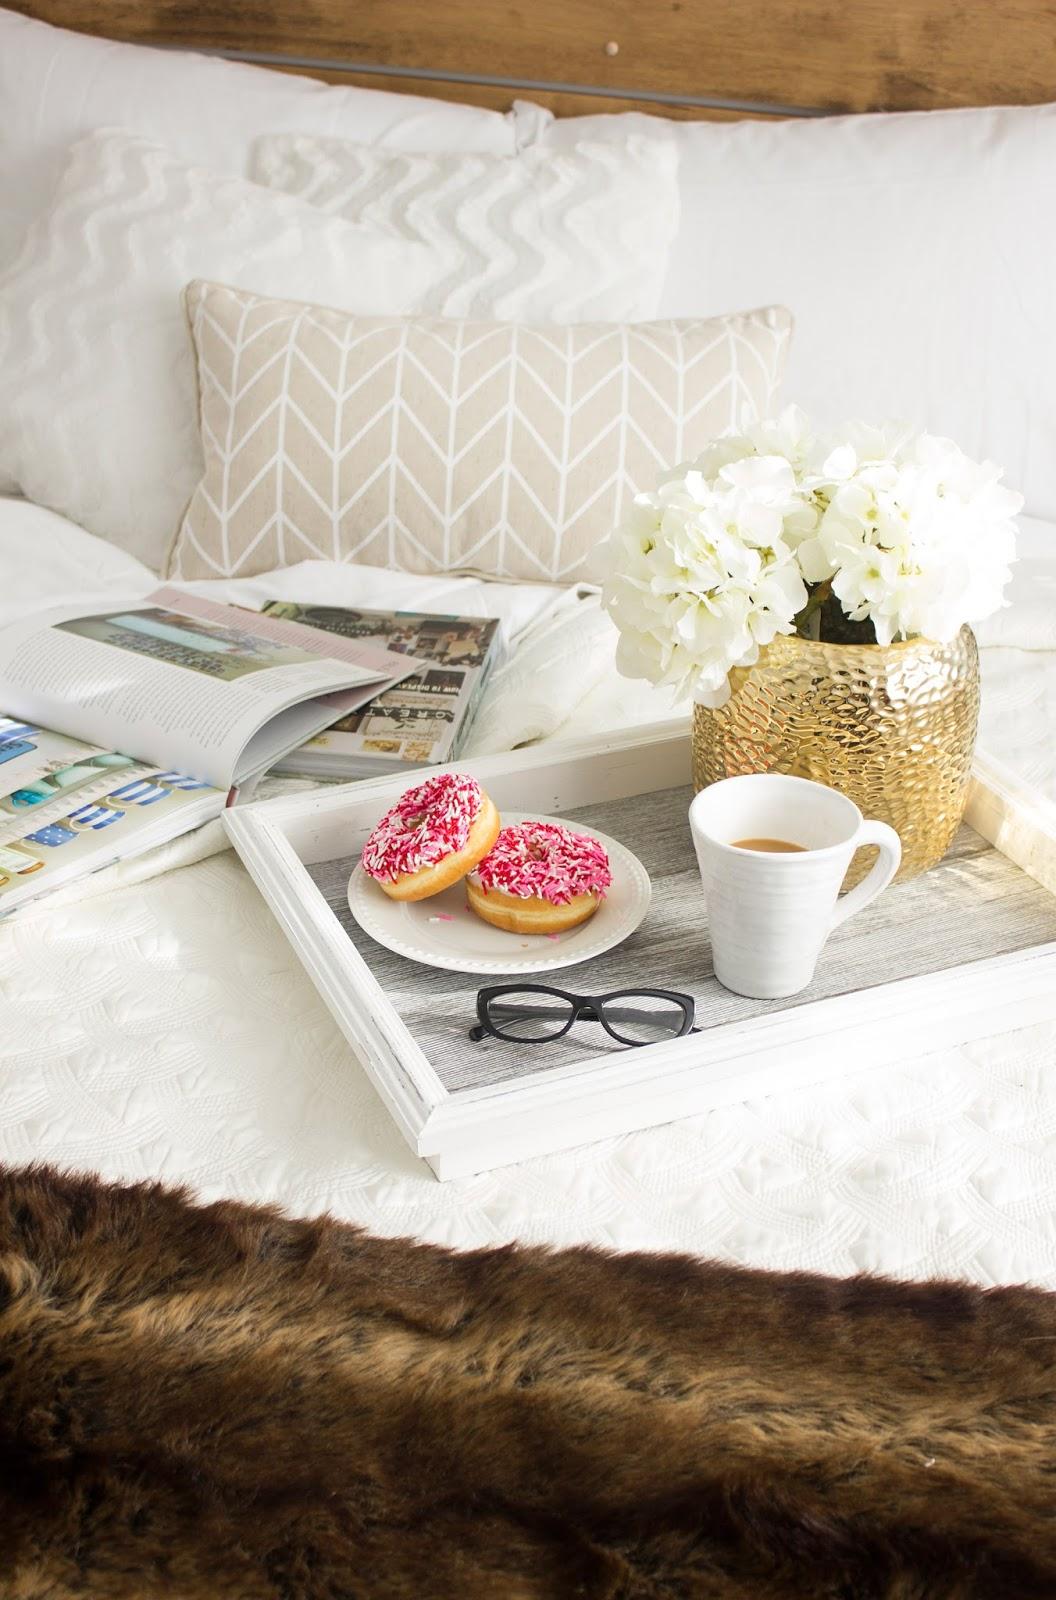 Urban-Barn-Reading-In-Bed